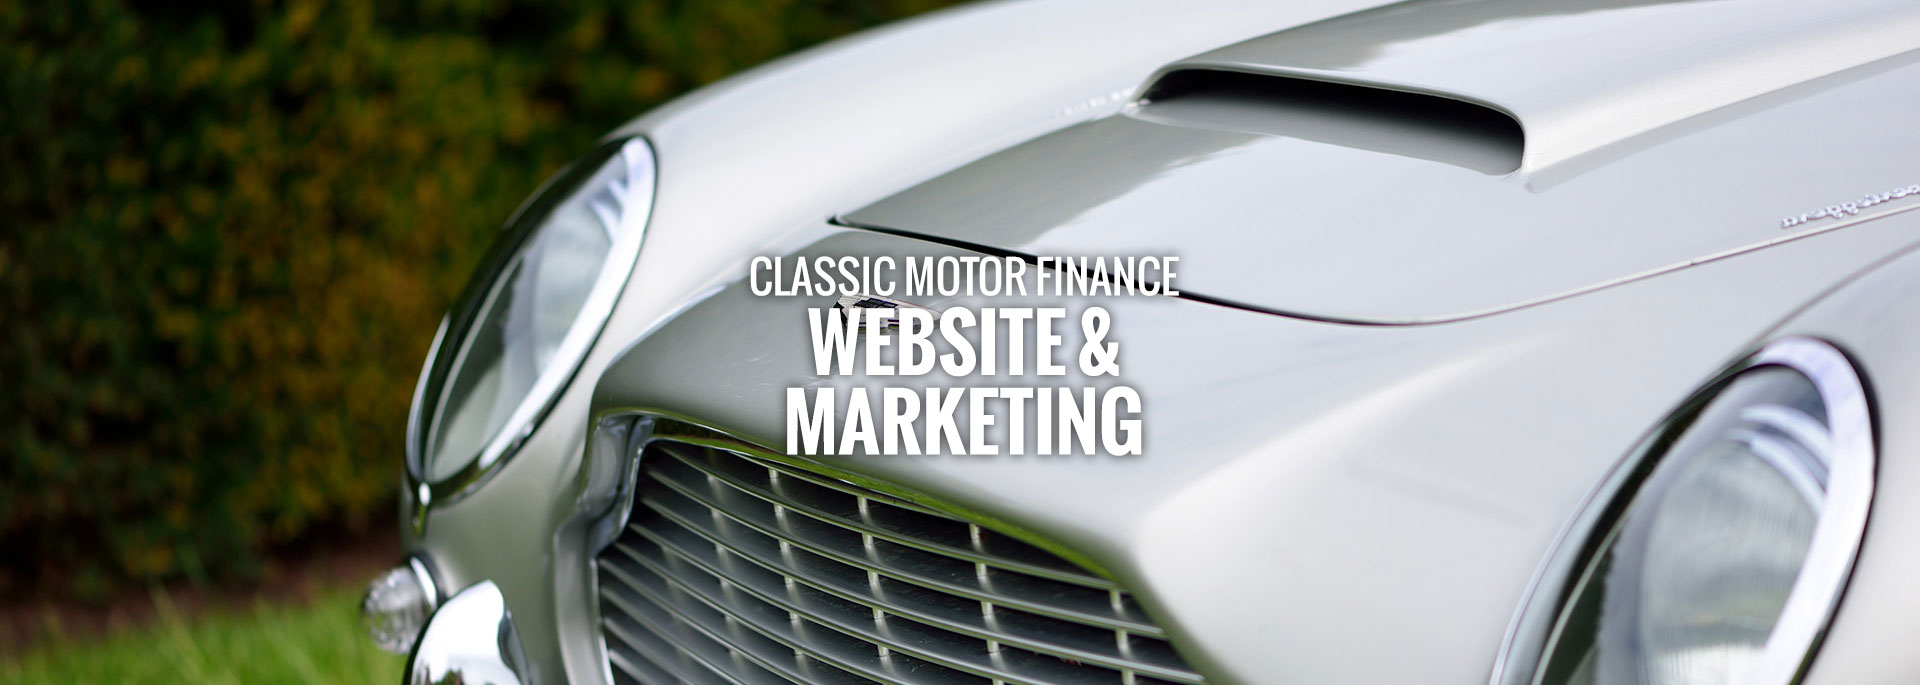 classic motor finance website marketing